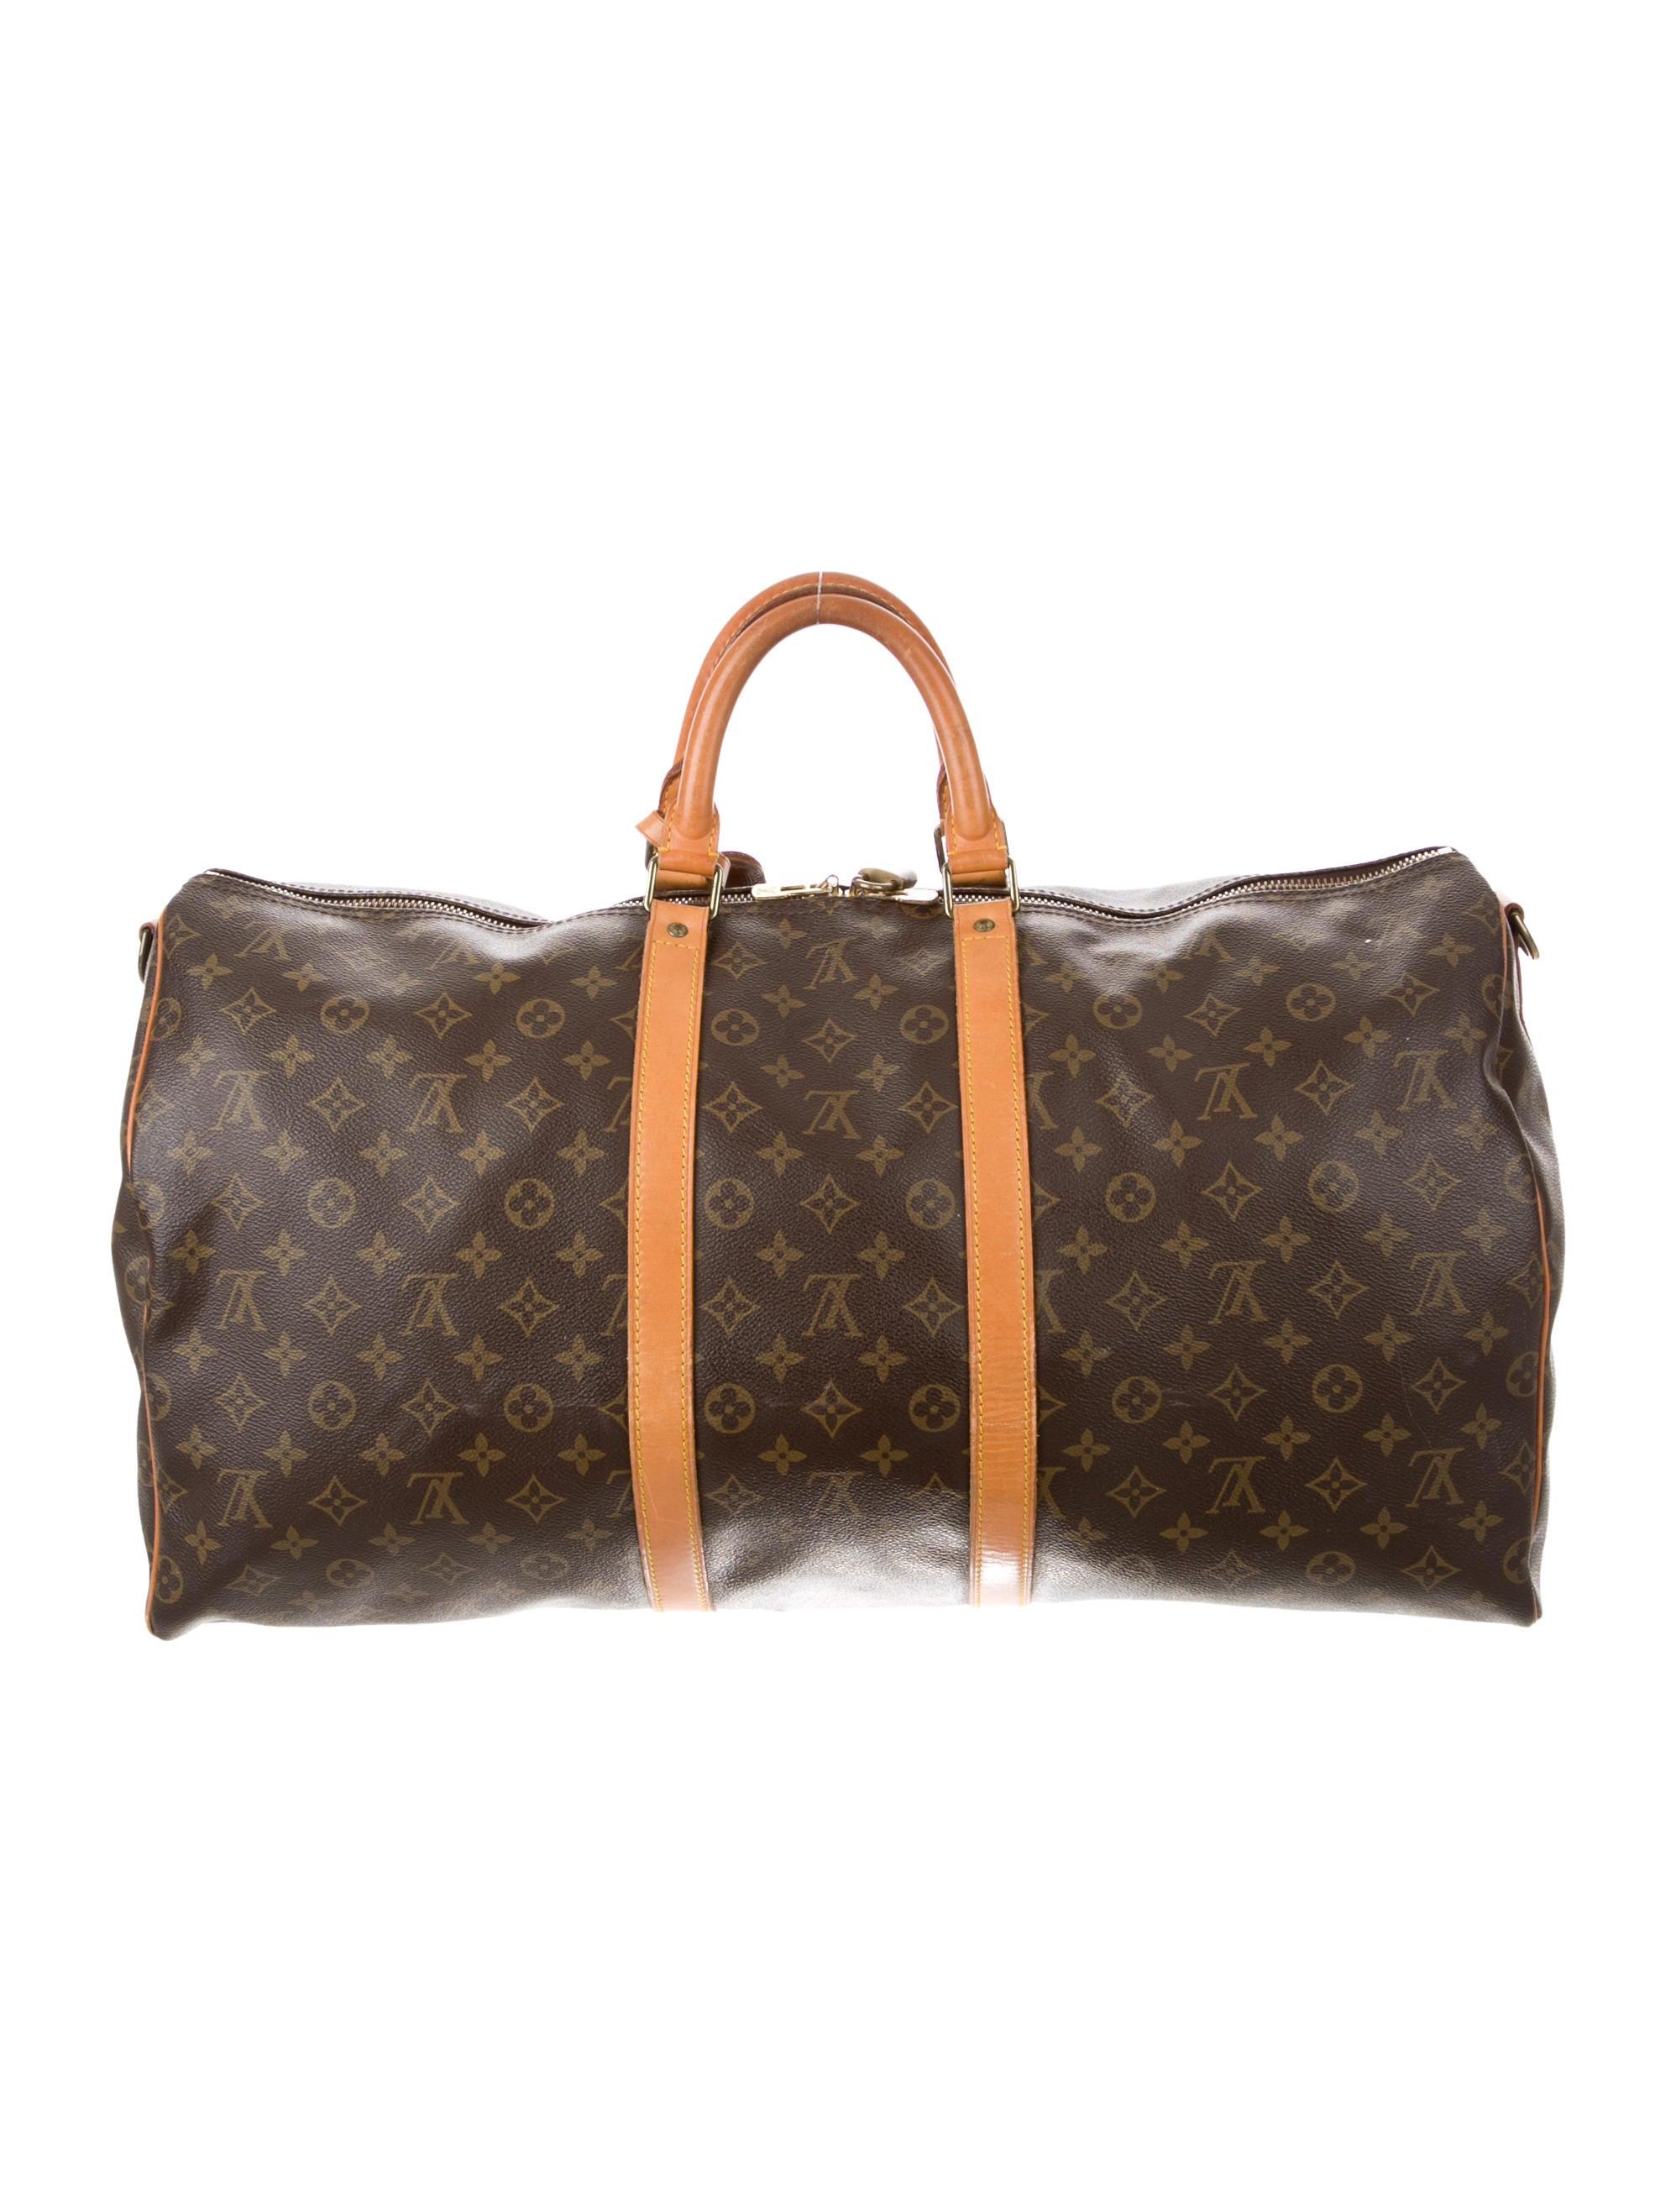 louis vuitton monogram keepall 55 bags lou119349 the realreal. Black Bedroom Furniture Sets. Home Design Ideas